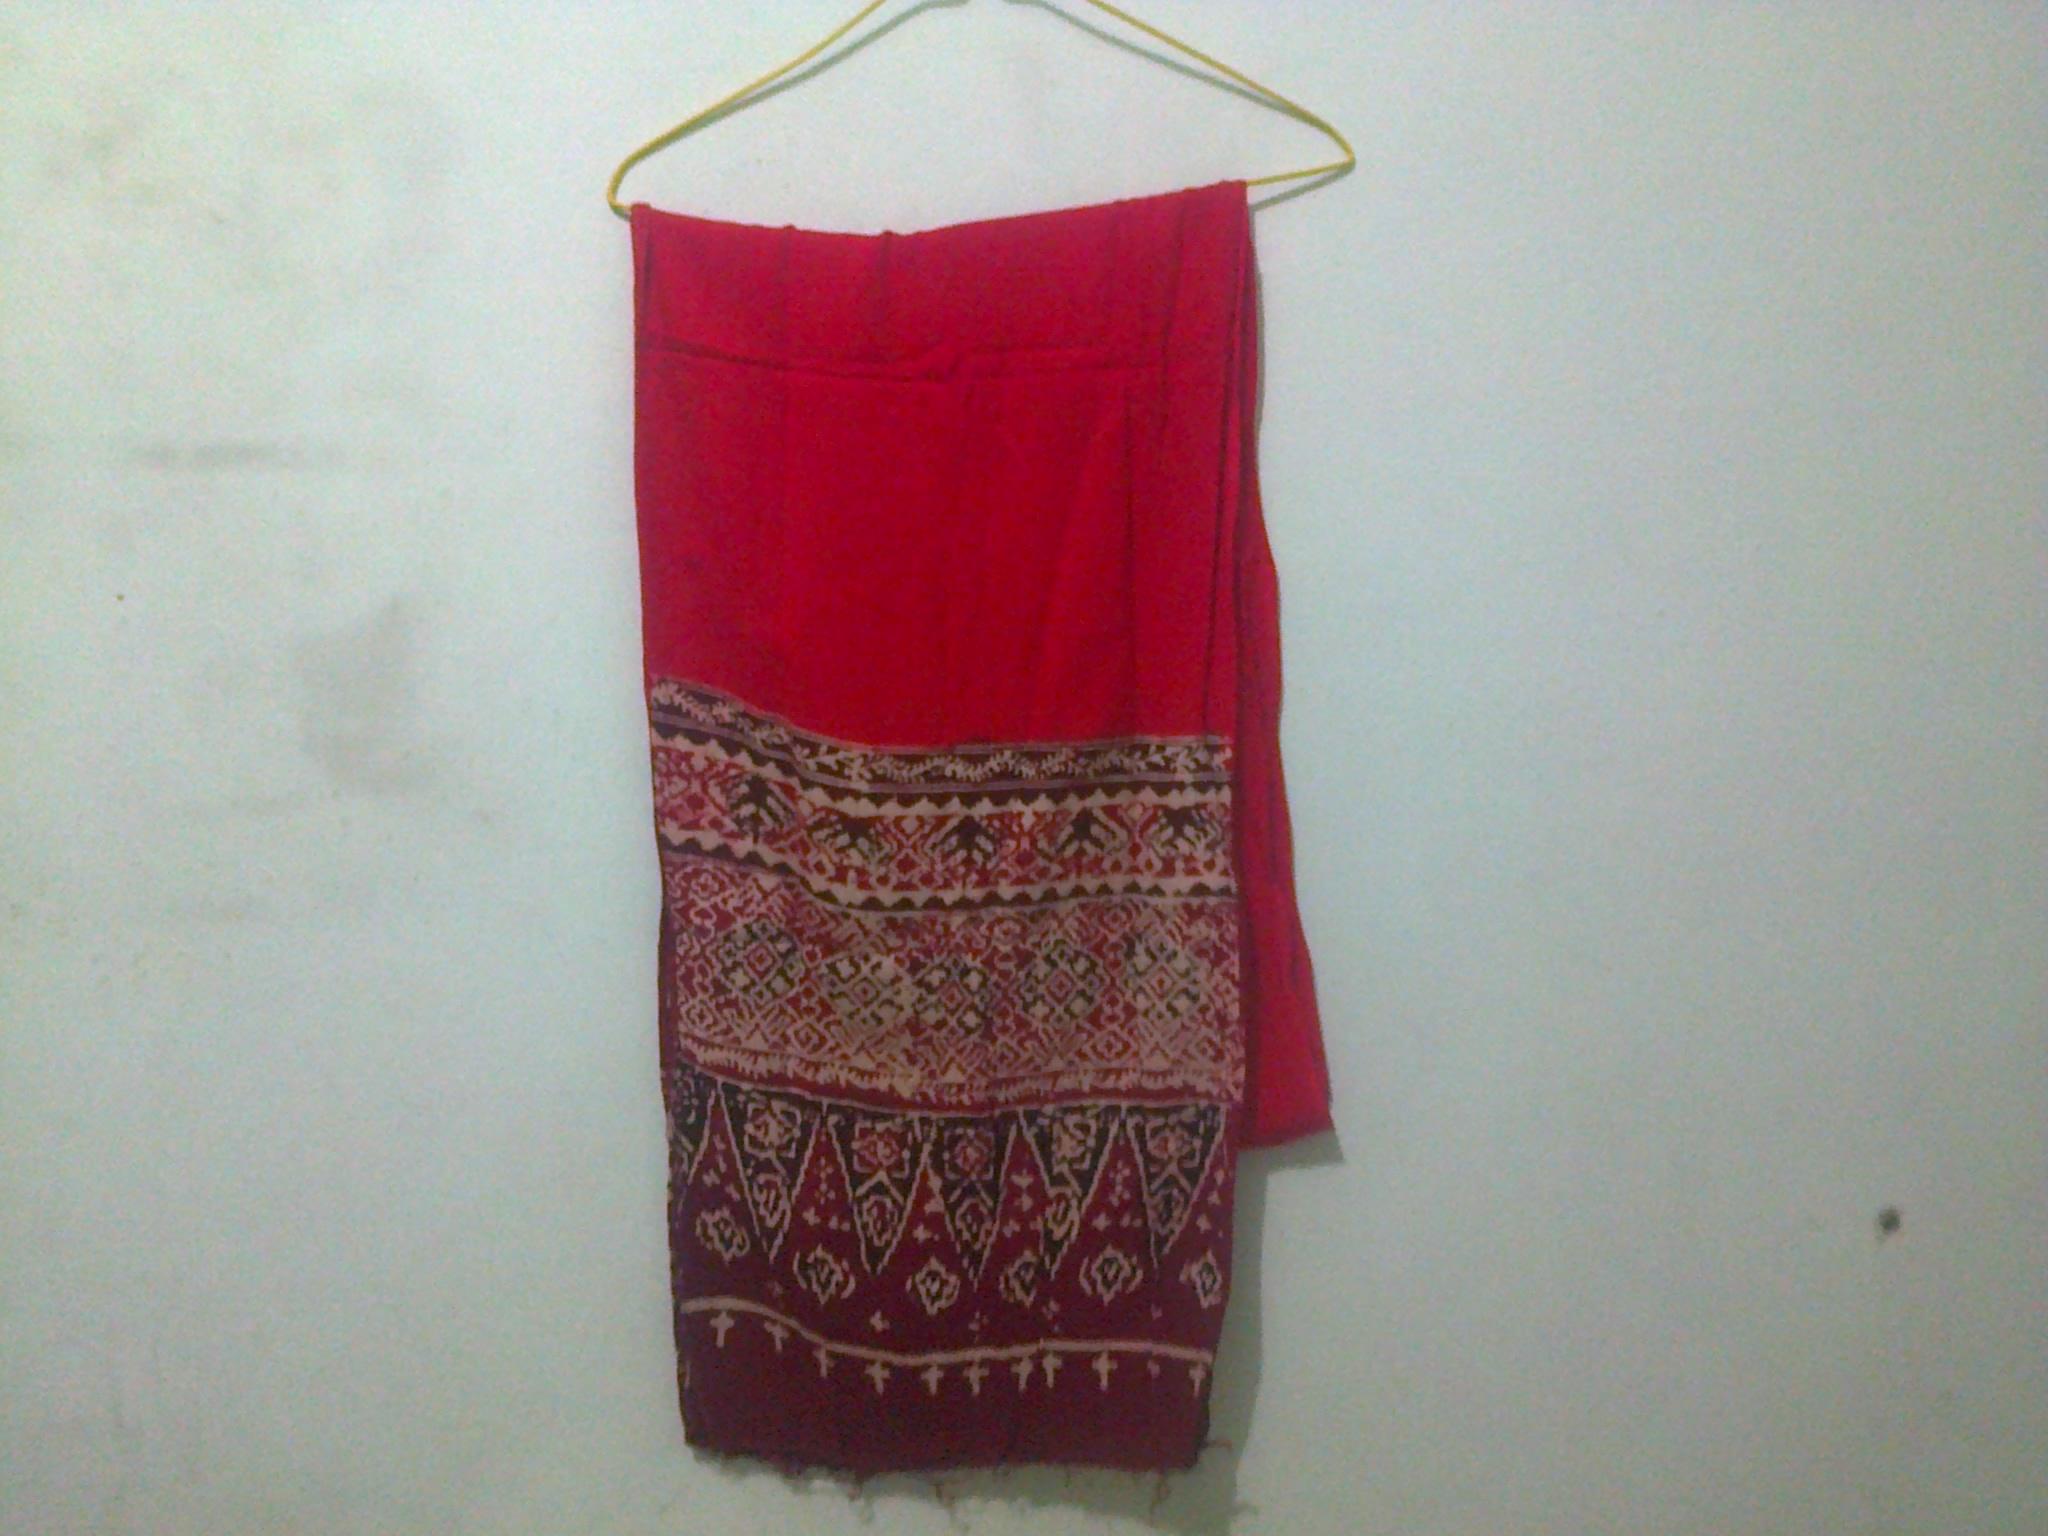 ... selendang tari batik | Jual selendang tari batik, selendang tari batik